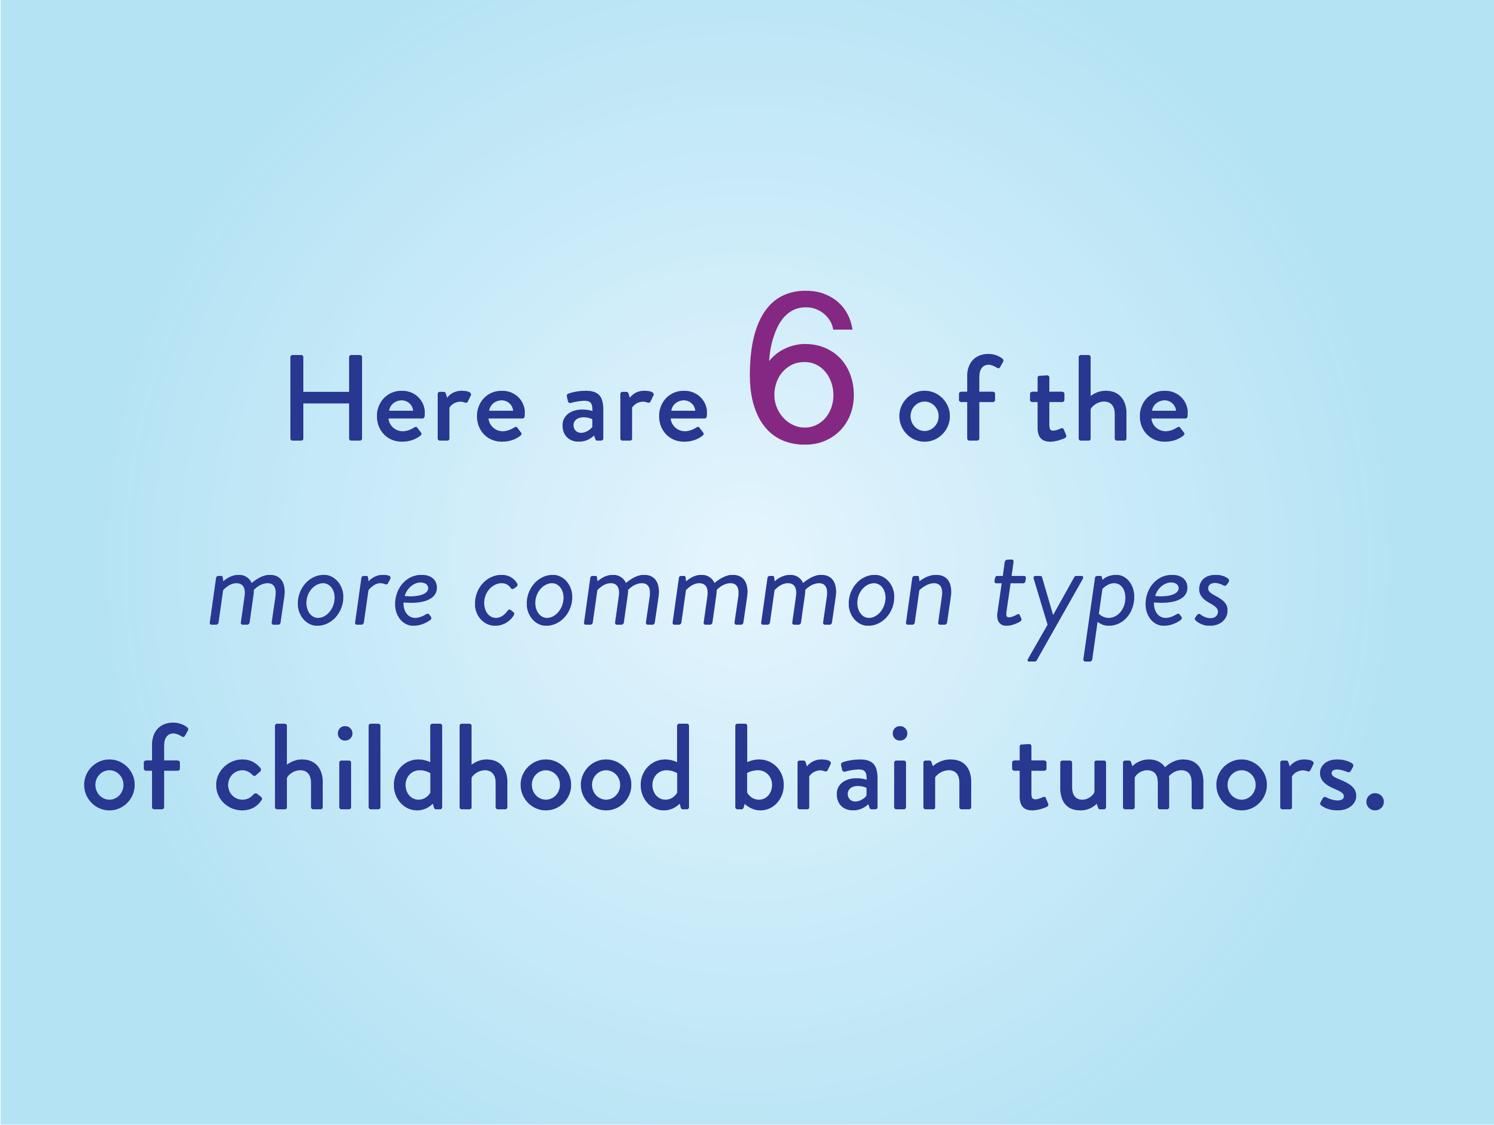 http://www.dana-farber.org/Pediatric-Care/Treatment-and-Support/Pediatric-Treatment-Centers-and-Clinical-Services/Pediatric-Brain-Tumor-Program.aspx